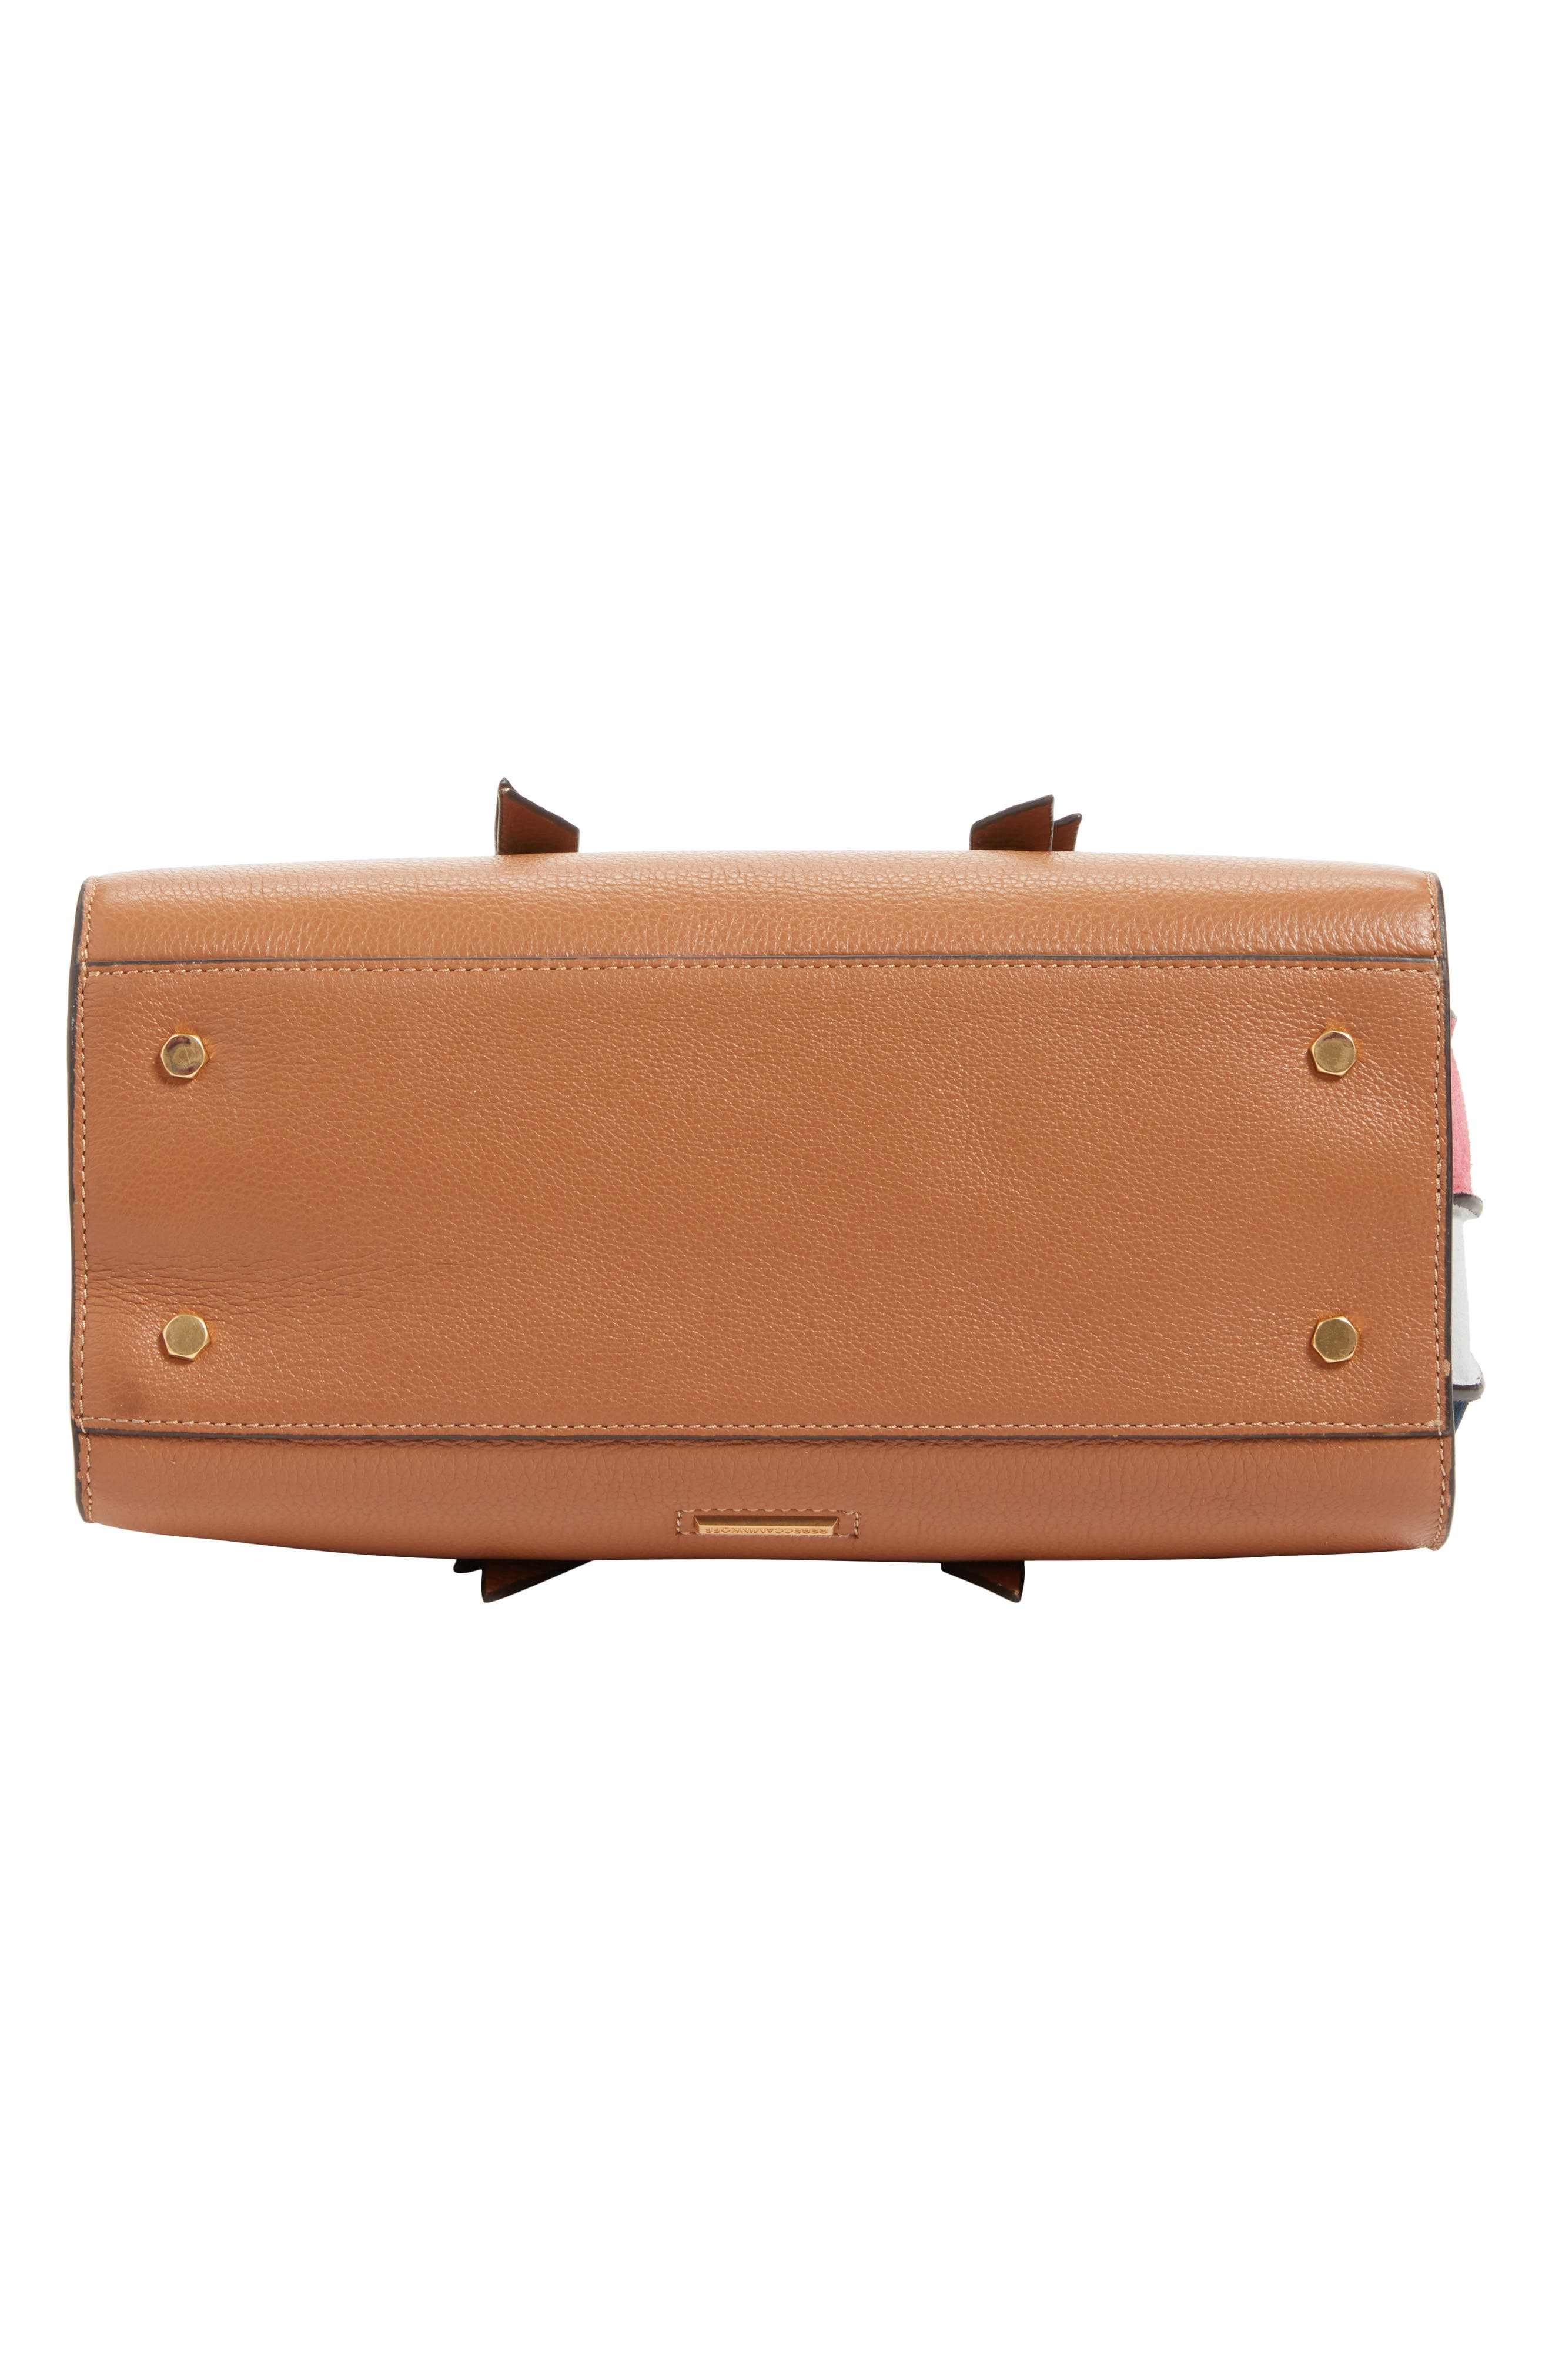 Sherry Calfskin Leather Satchel,                             Alternate thumbnail 6, color,                             ALMOND MULTI